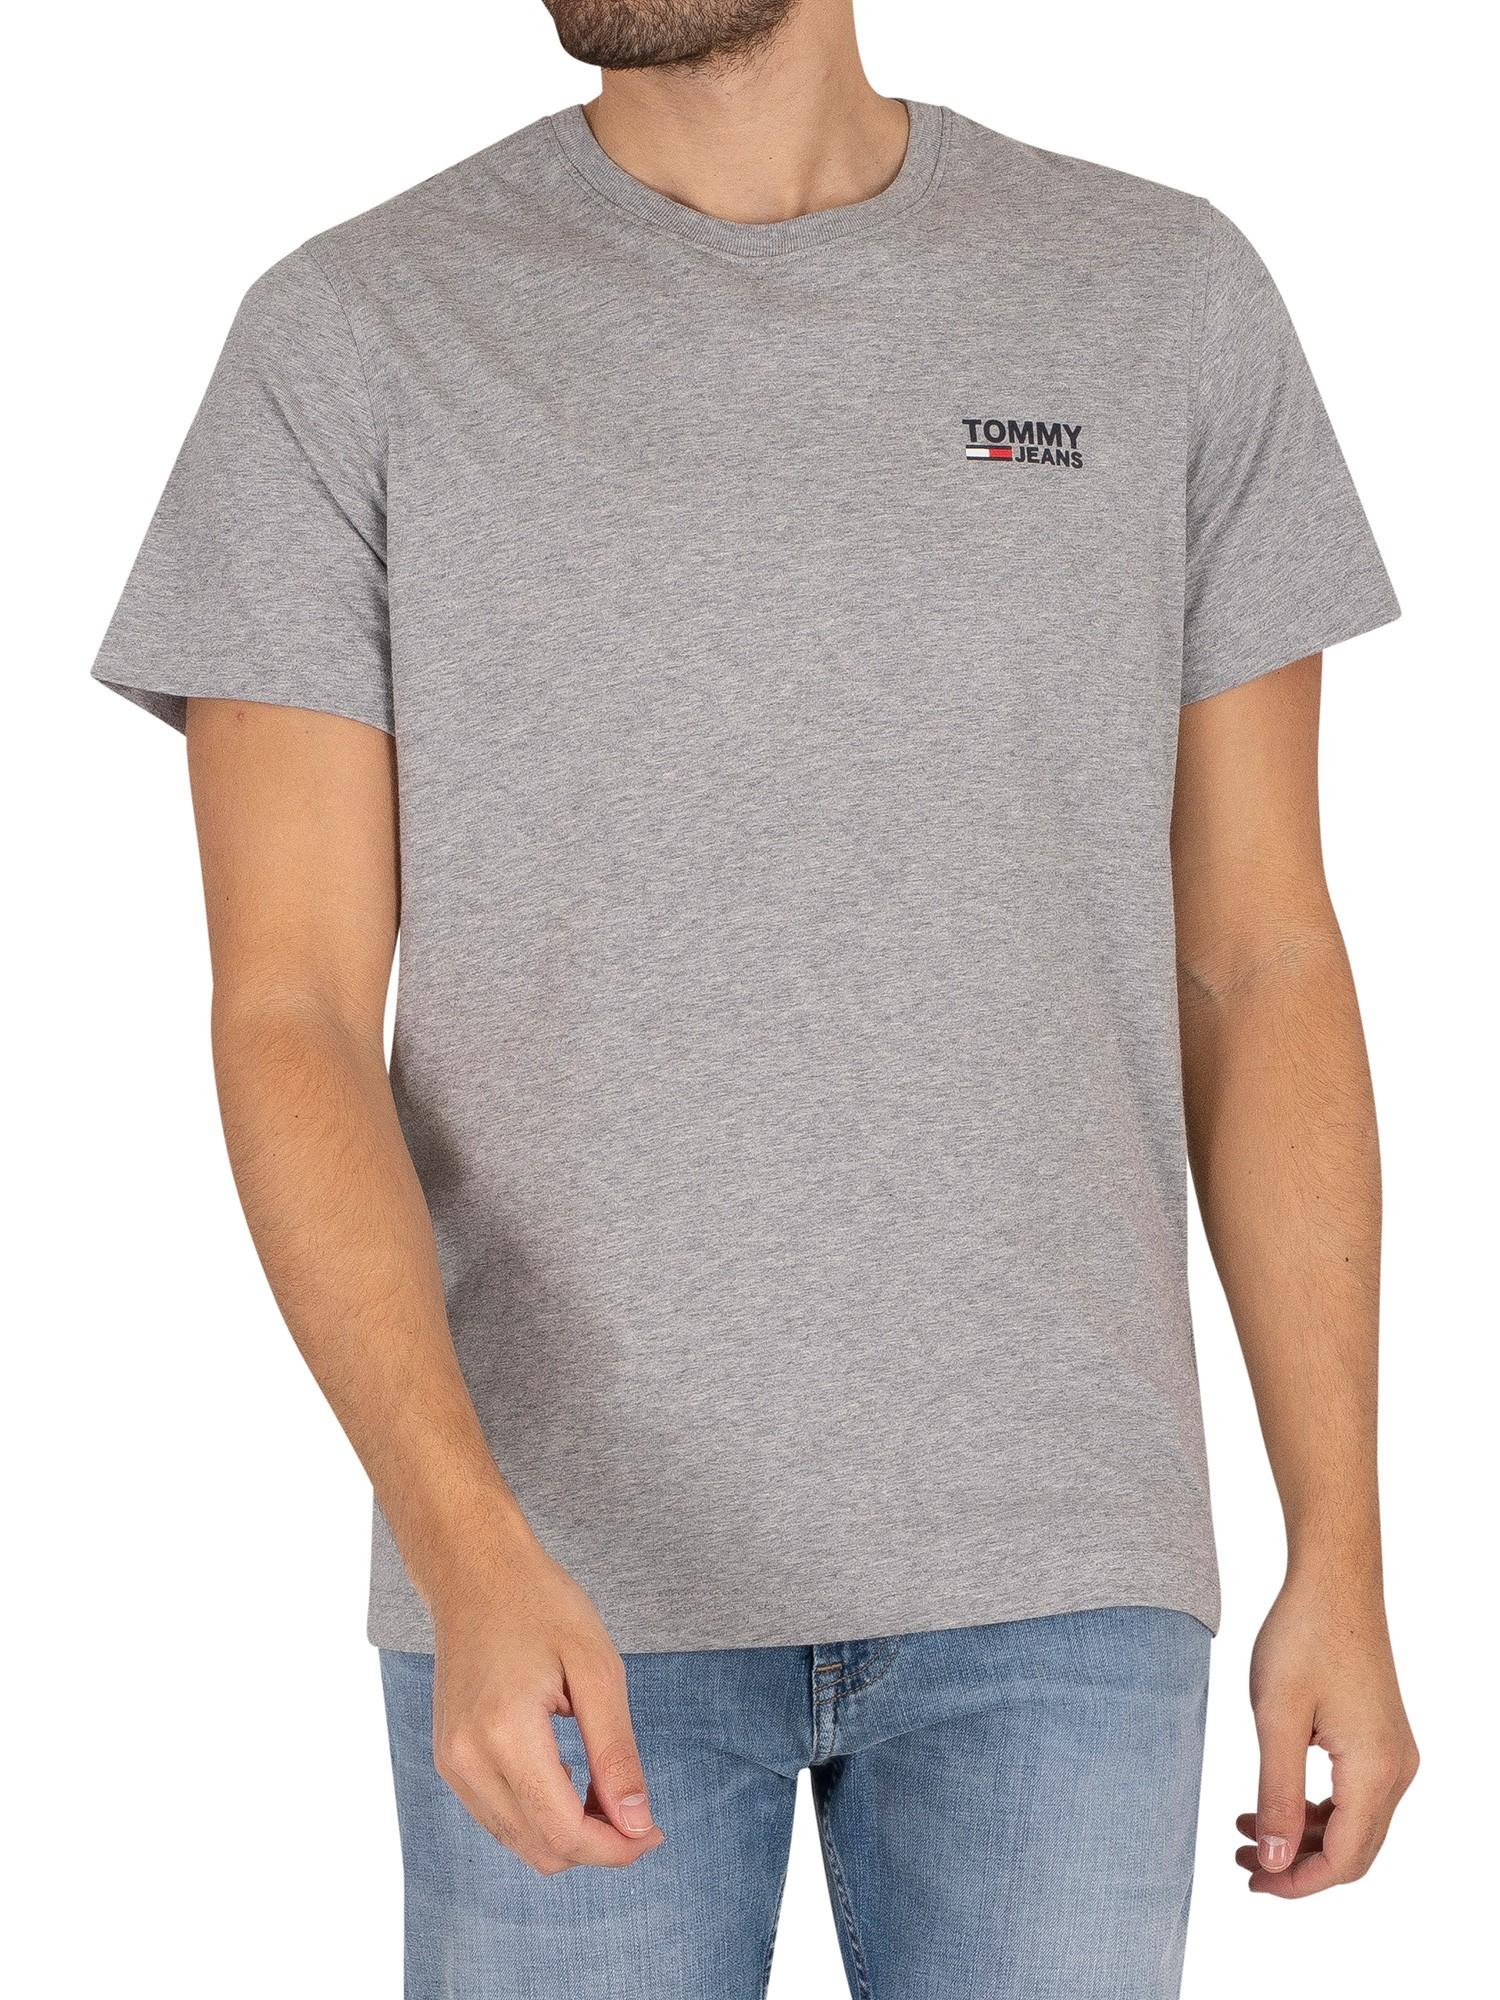 Regular Corp Logo T-Shirt